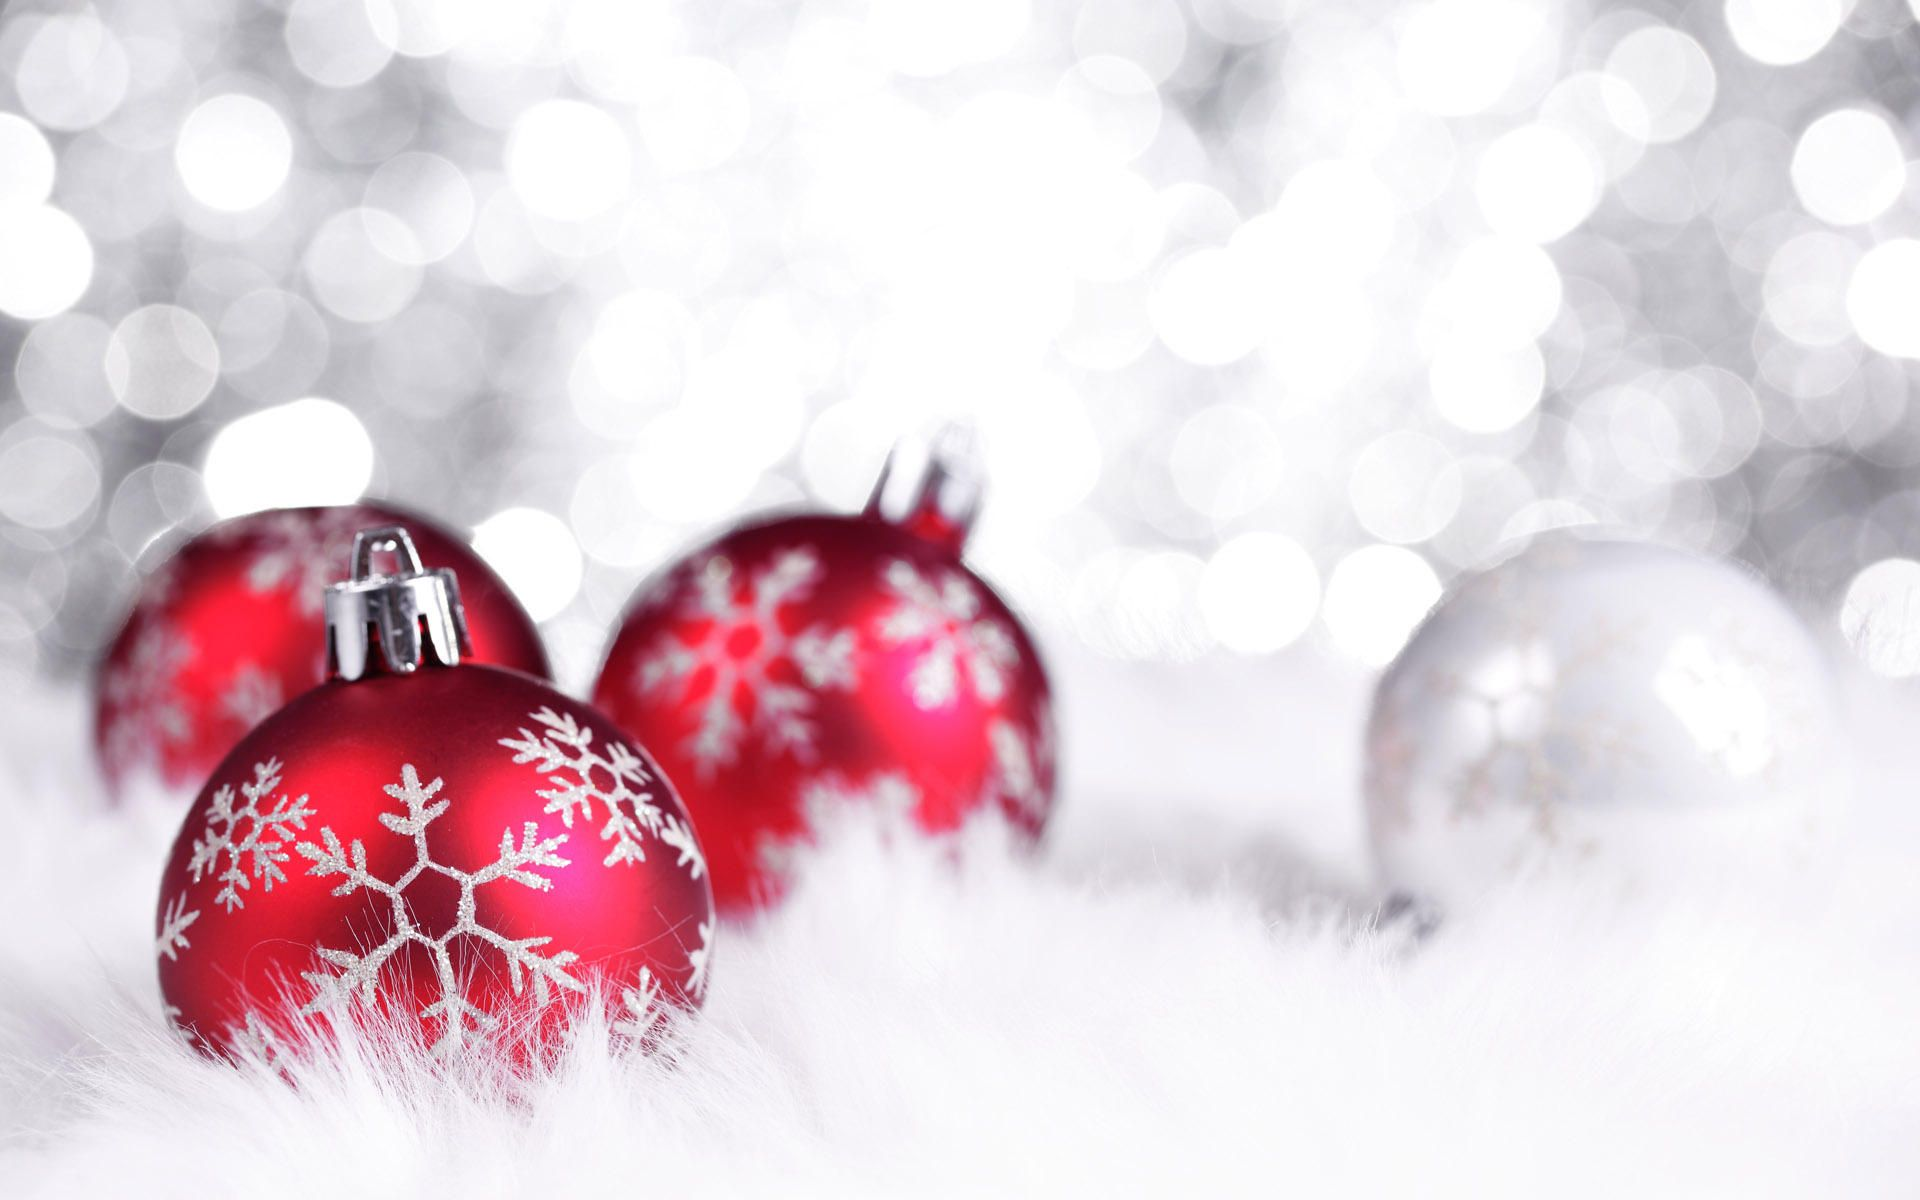 Christmas Wallpaper Free.Christmas Wallpapers Top Free Christmas Backgrounds